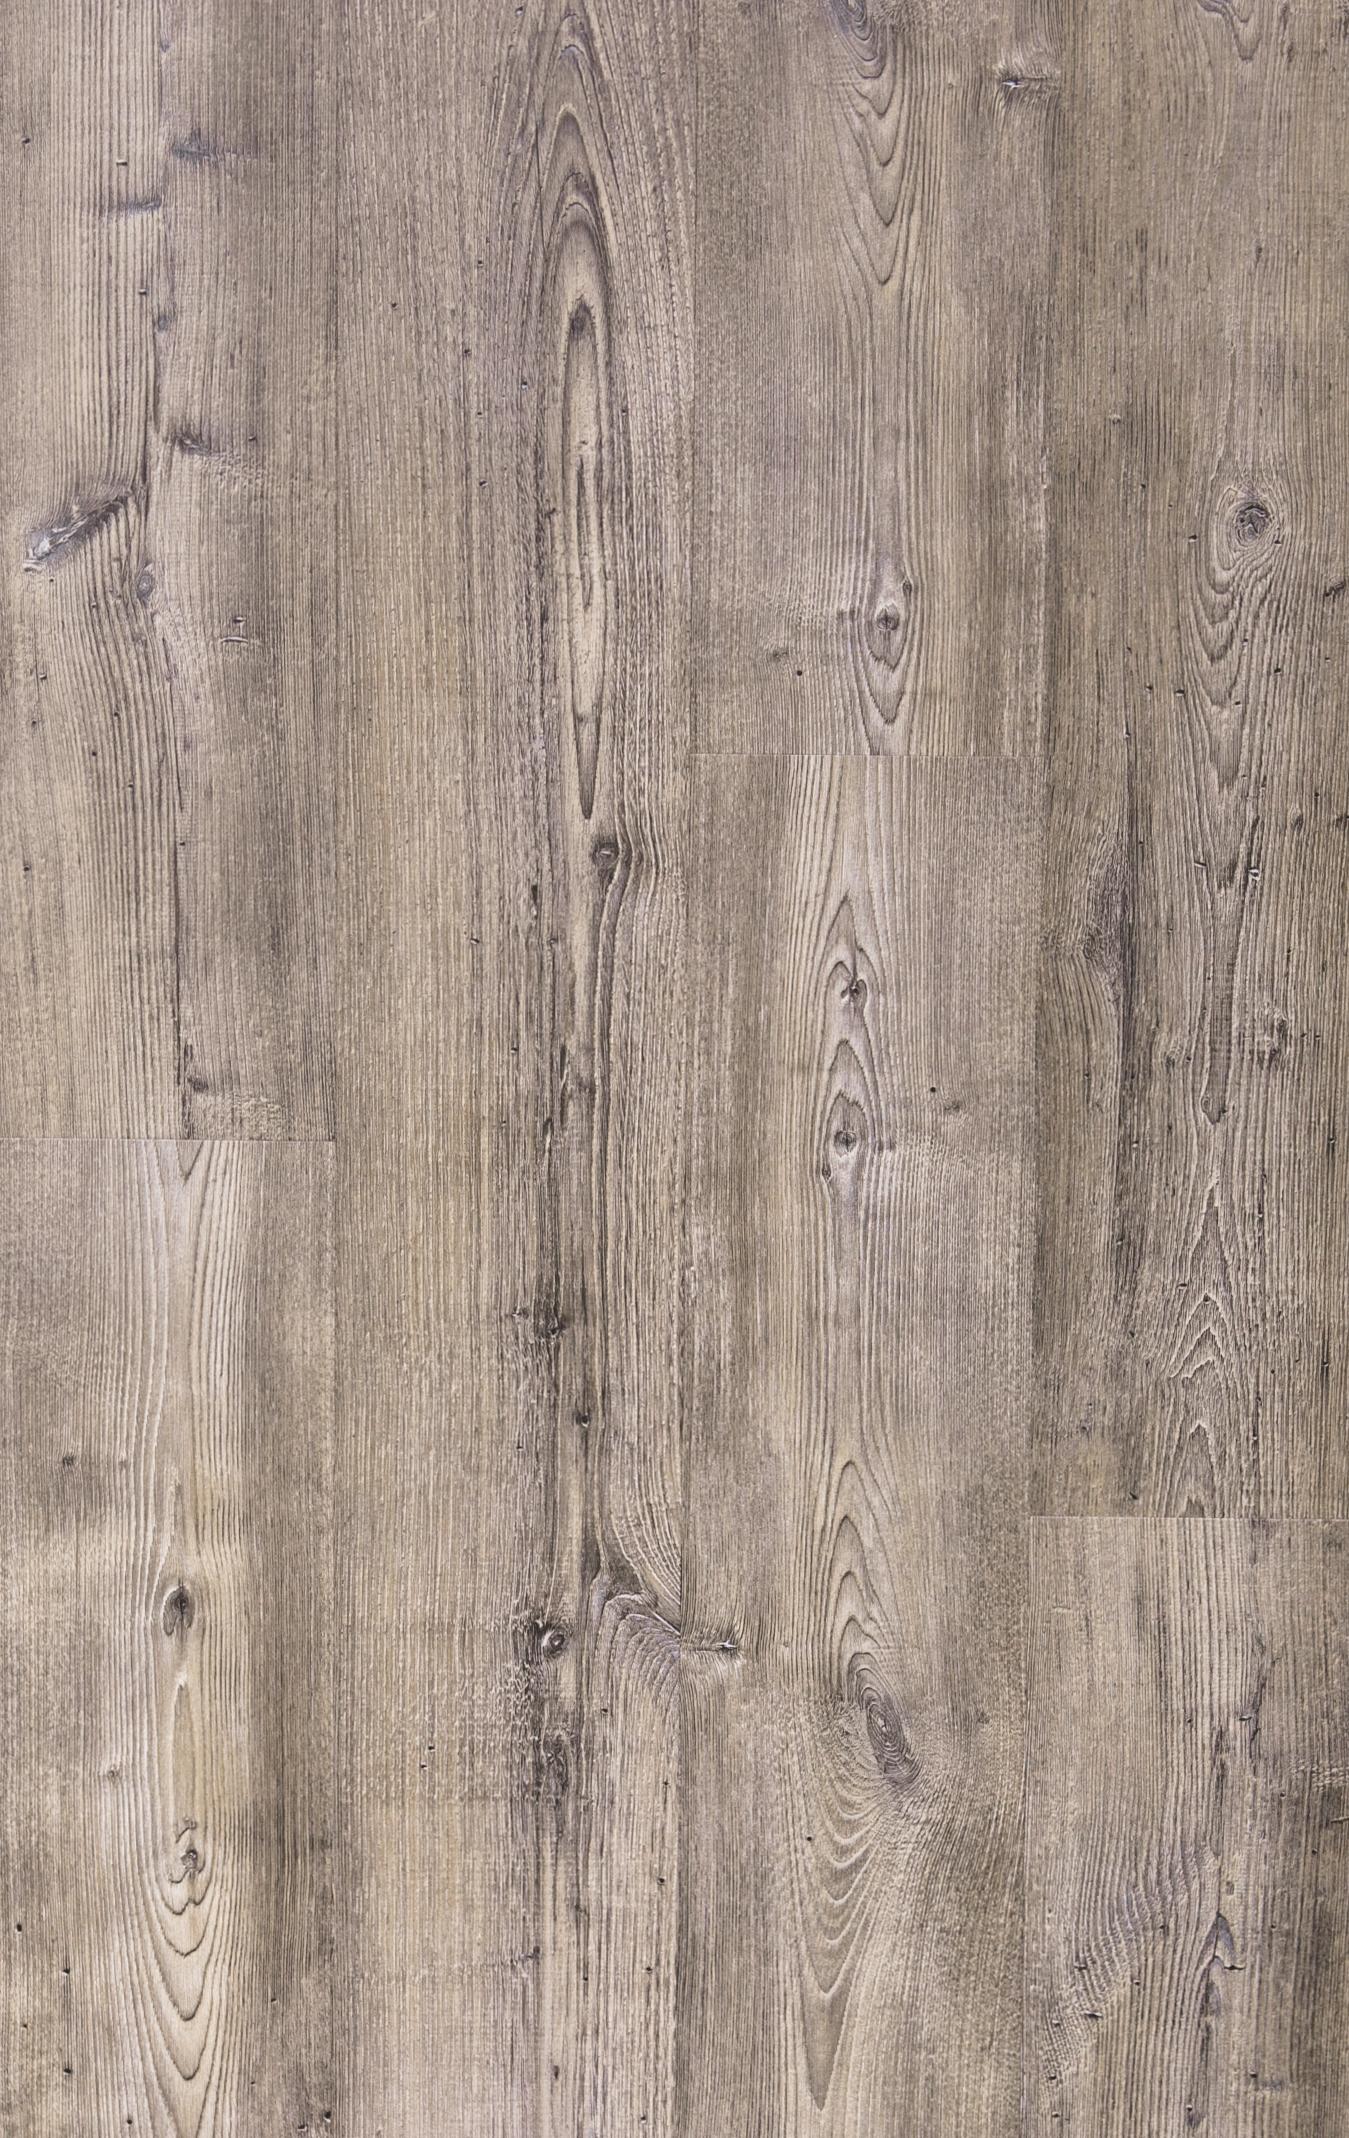 W301 - Blackwell Pine